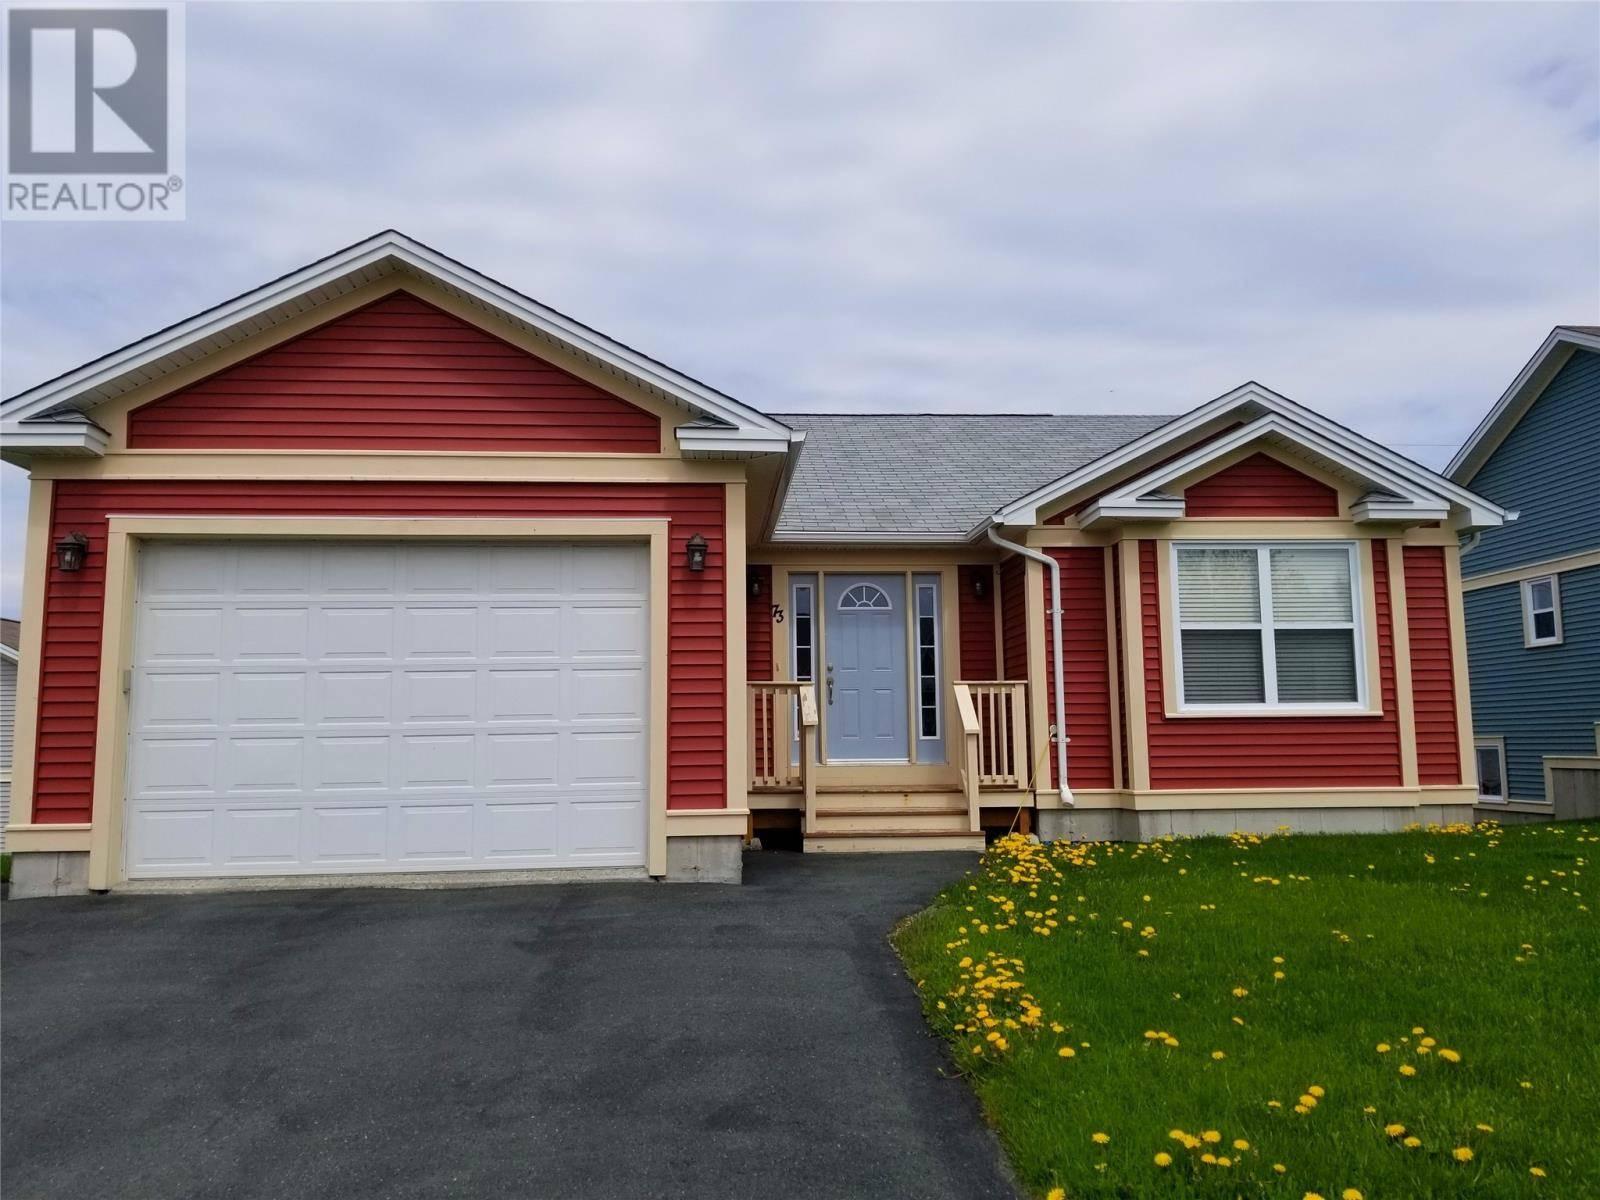 House for sale at 73 Shortall St St. John's Newfoundland - MLS: 1199279